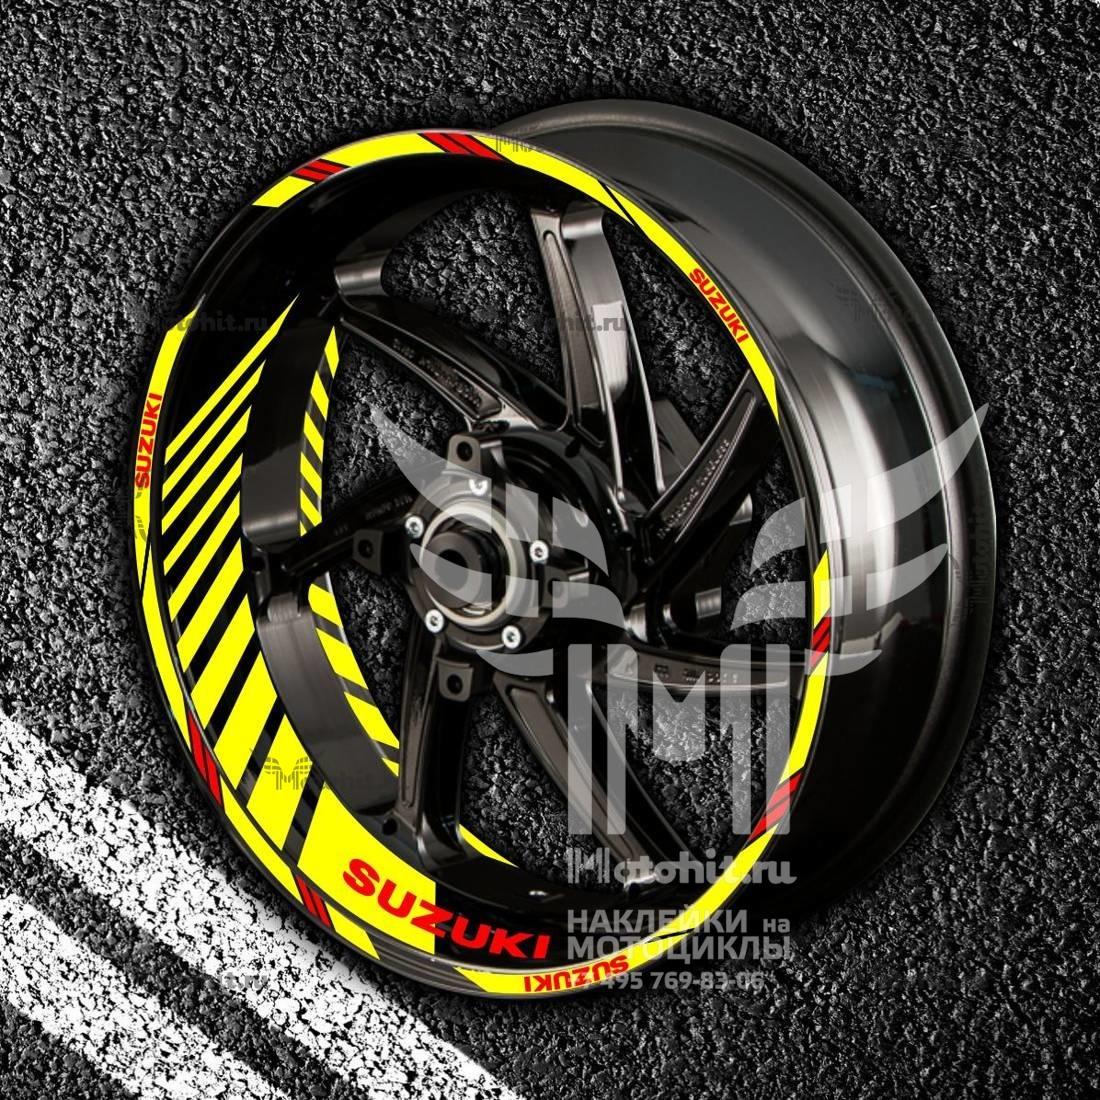 Комплект наклеек с полосами на колеса мотоцикла SUZUKI SUZUKI